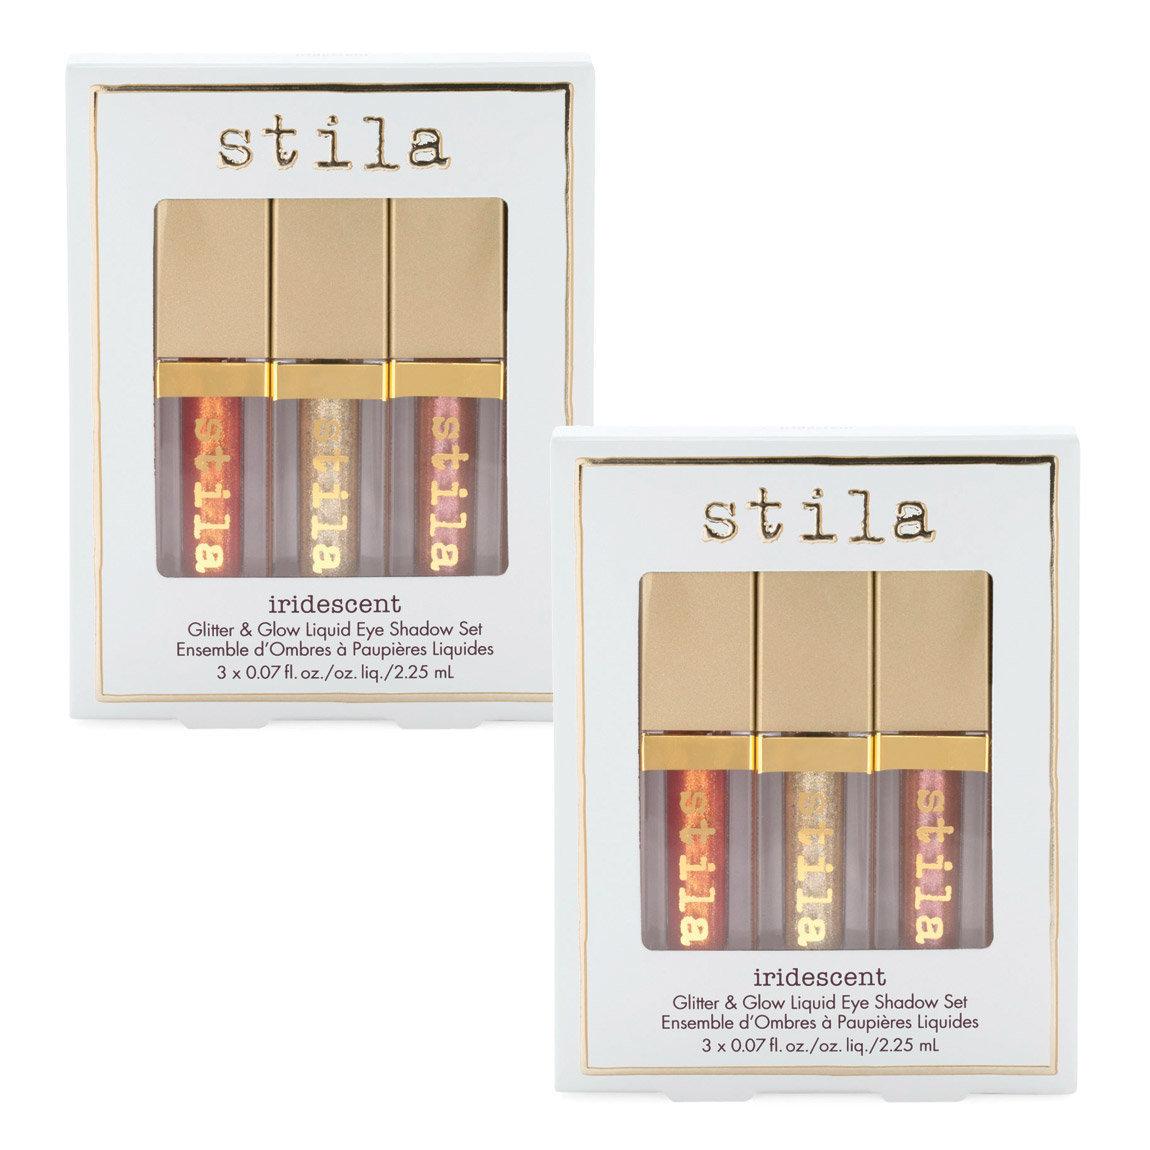 Buy one Stila Iridescent Glitter & Glow Liquid Eye Shadow Set, get one free